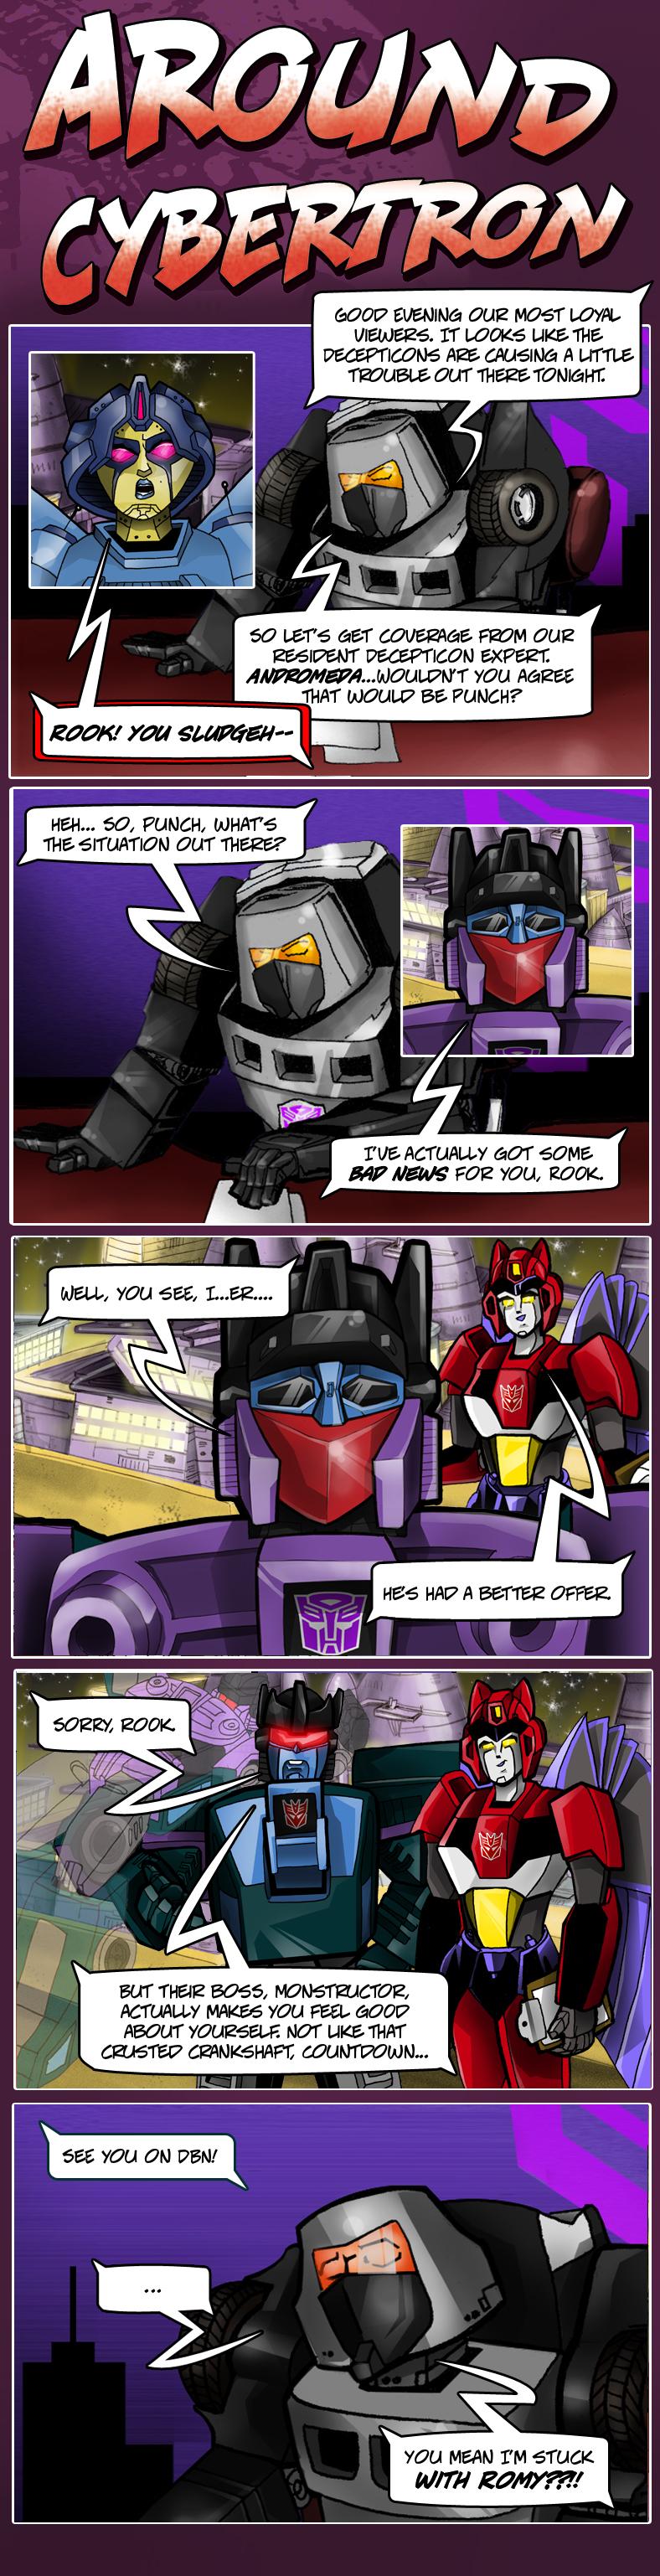 Around Cybertron Part 8 by RID-NightViper